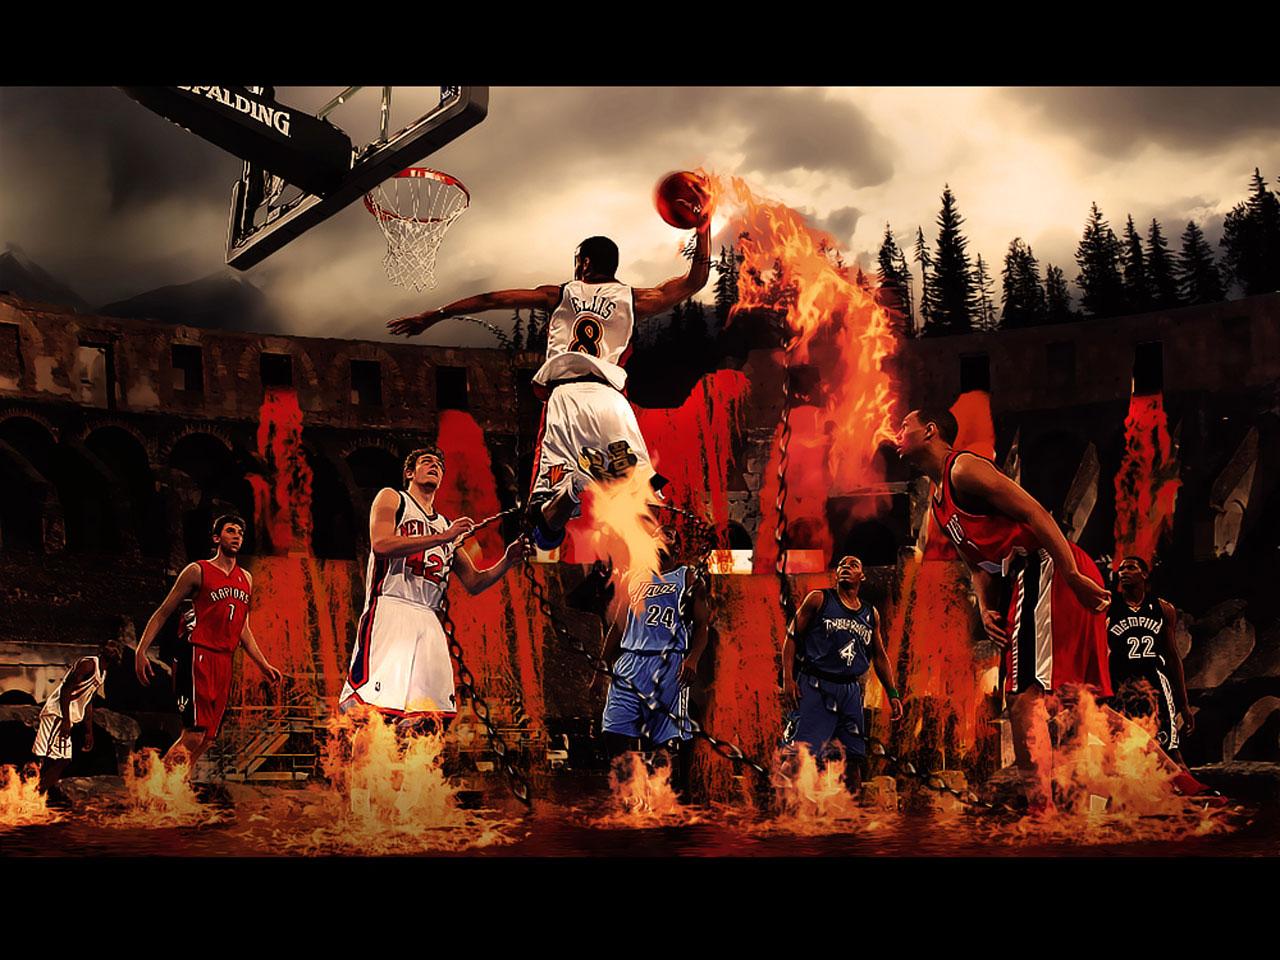 Top NBA Wallpapers Monta Ellis Wallpaper 1280x960